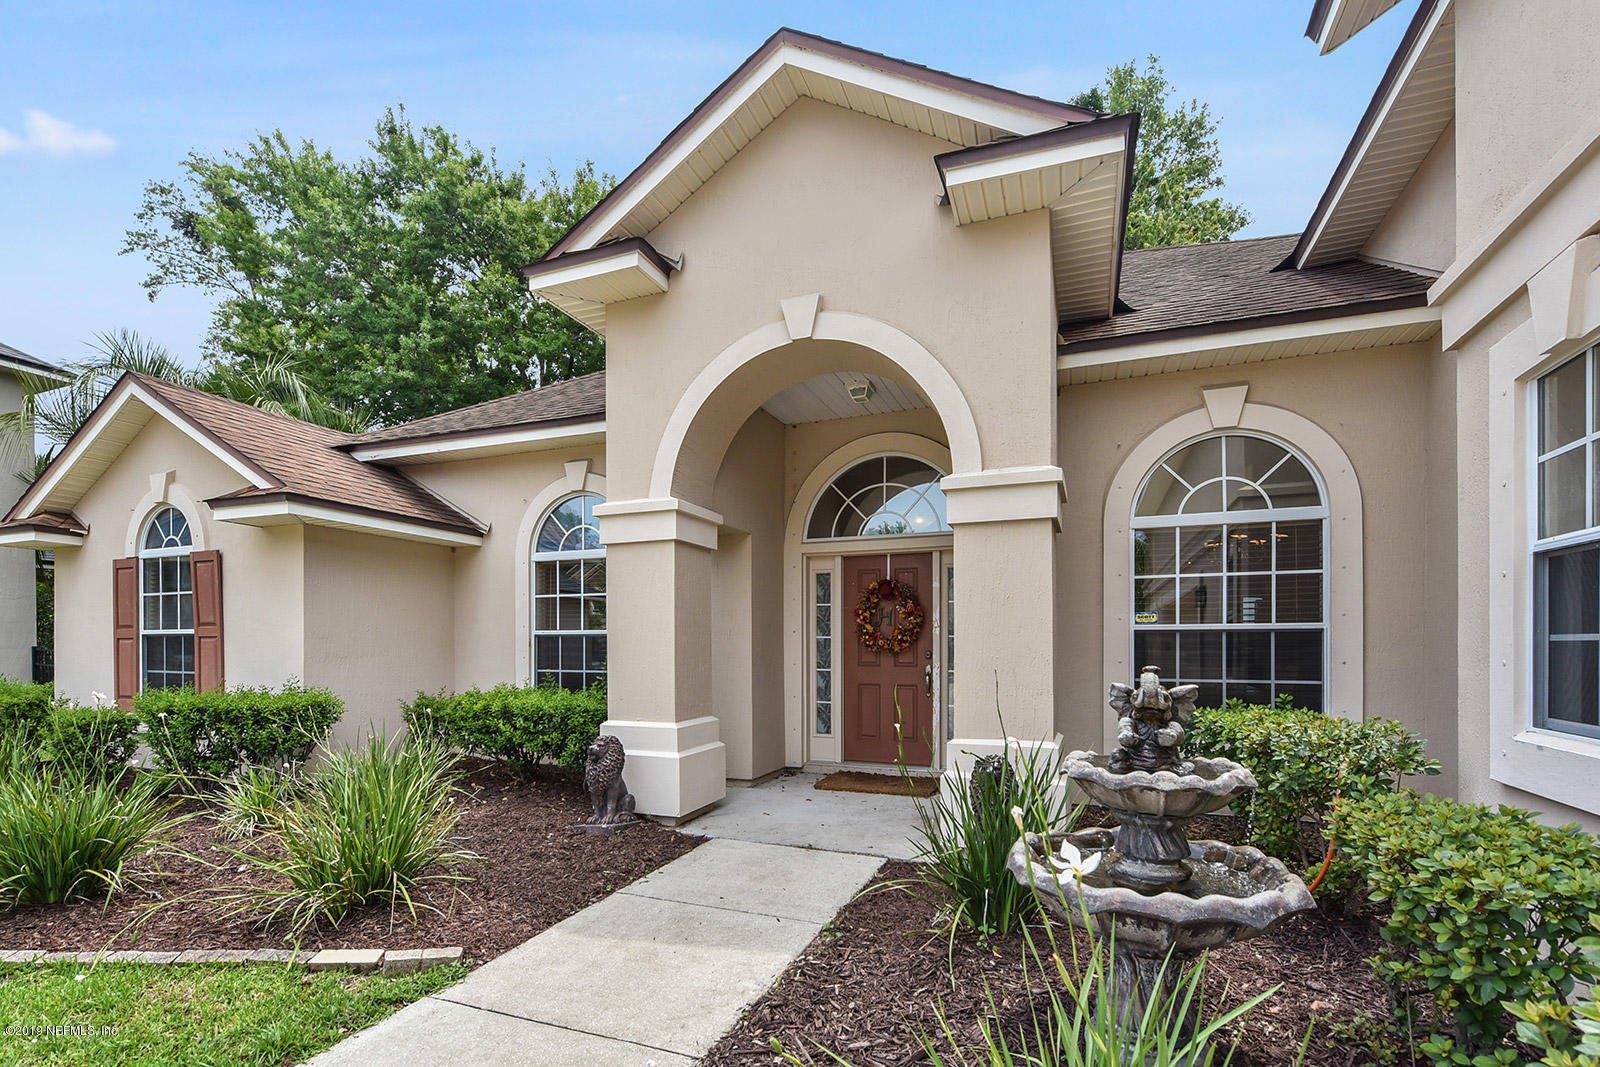 13653 Chipperfield Ln Jacksonville, FL 32226